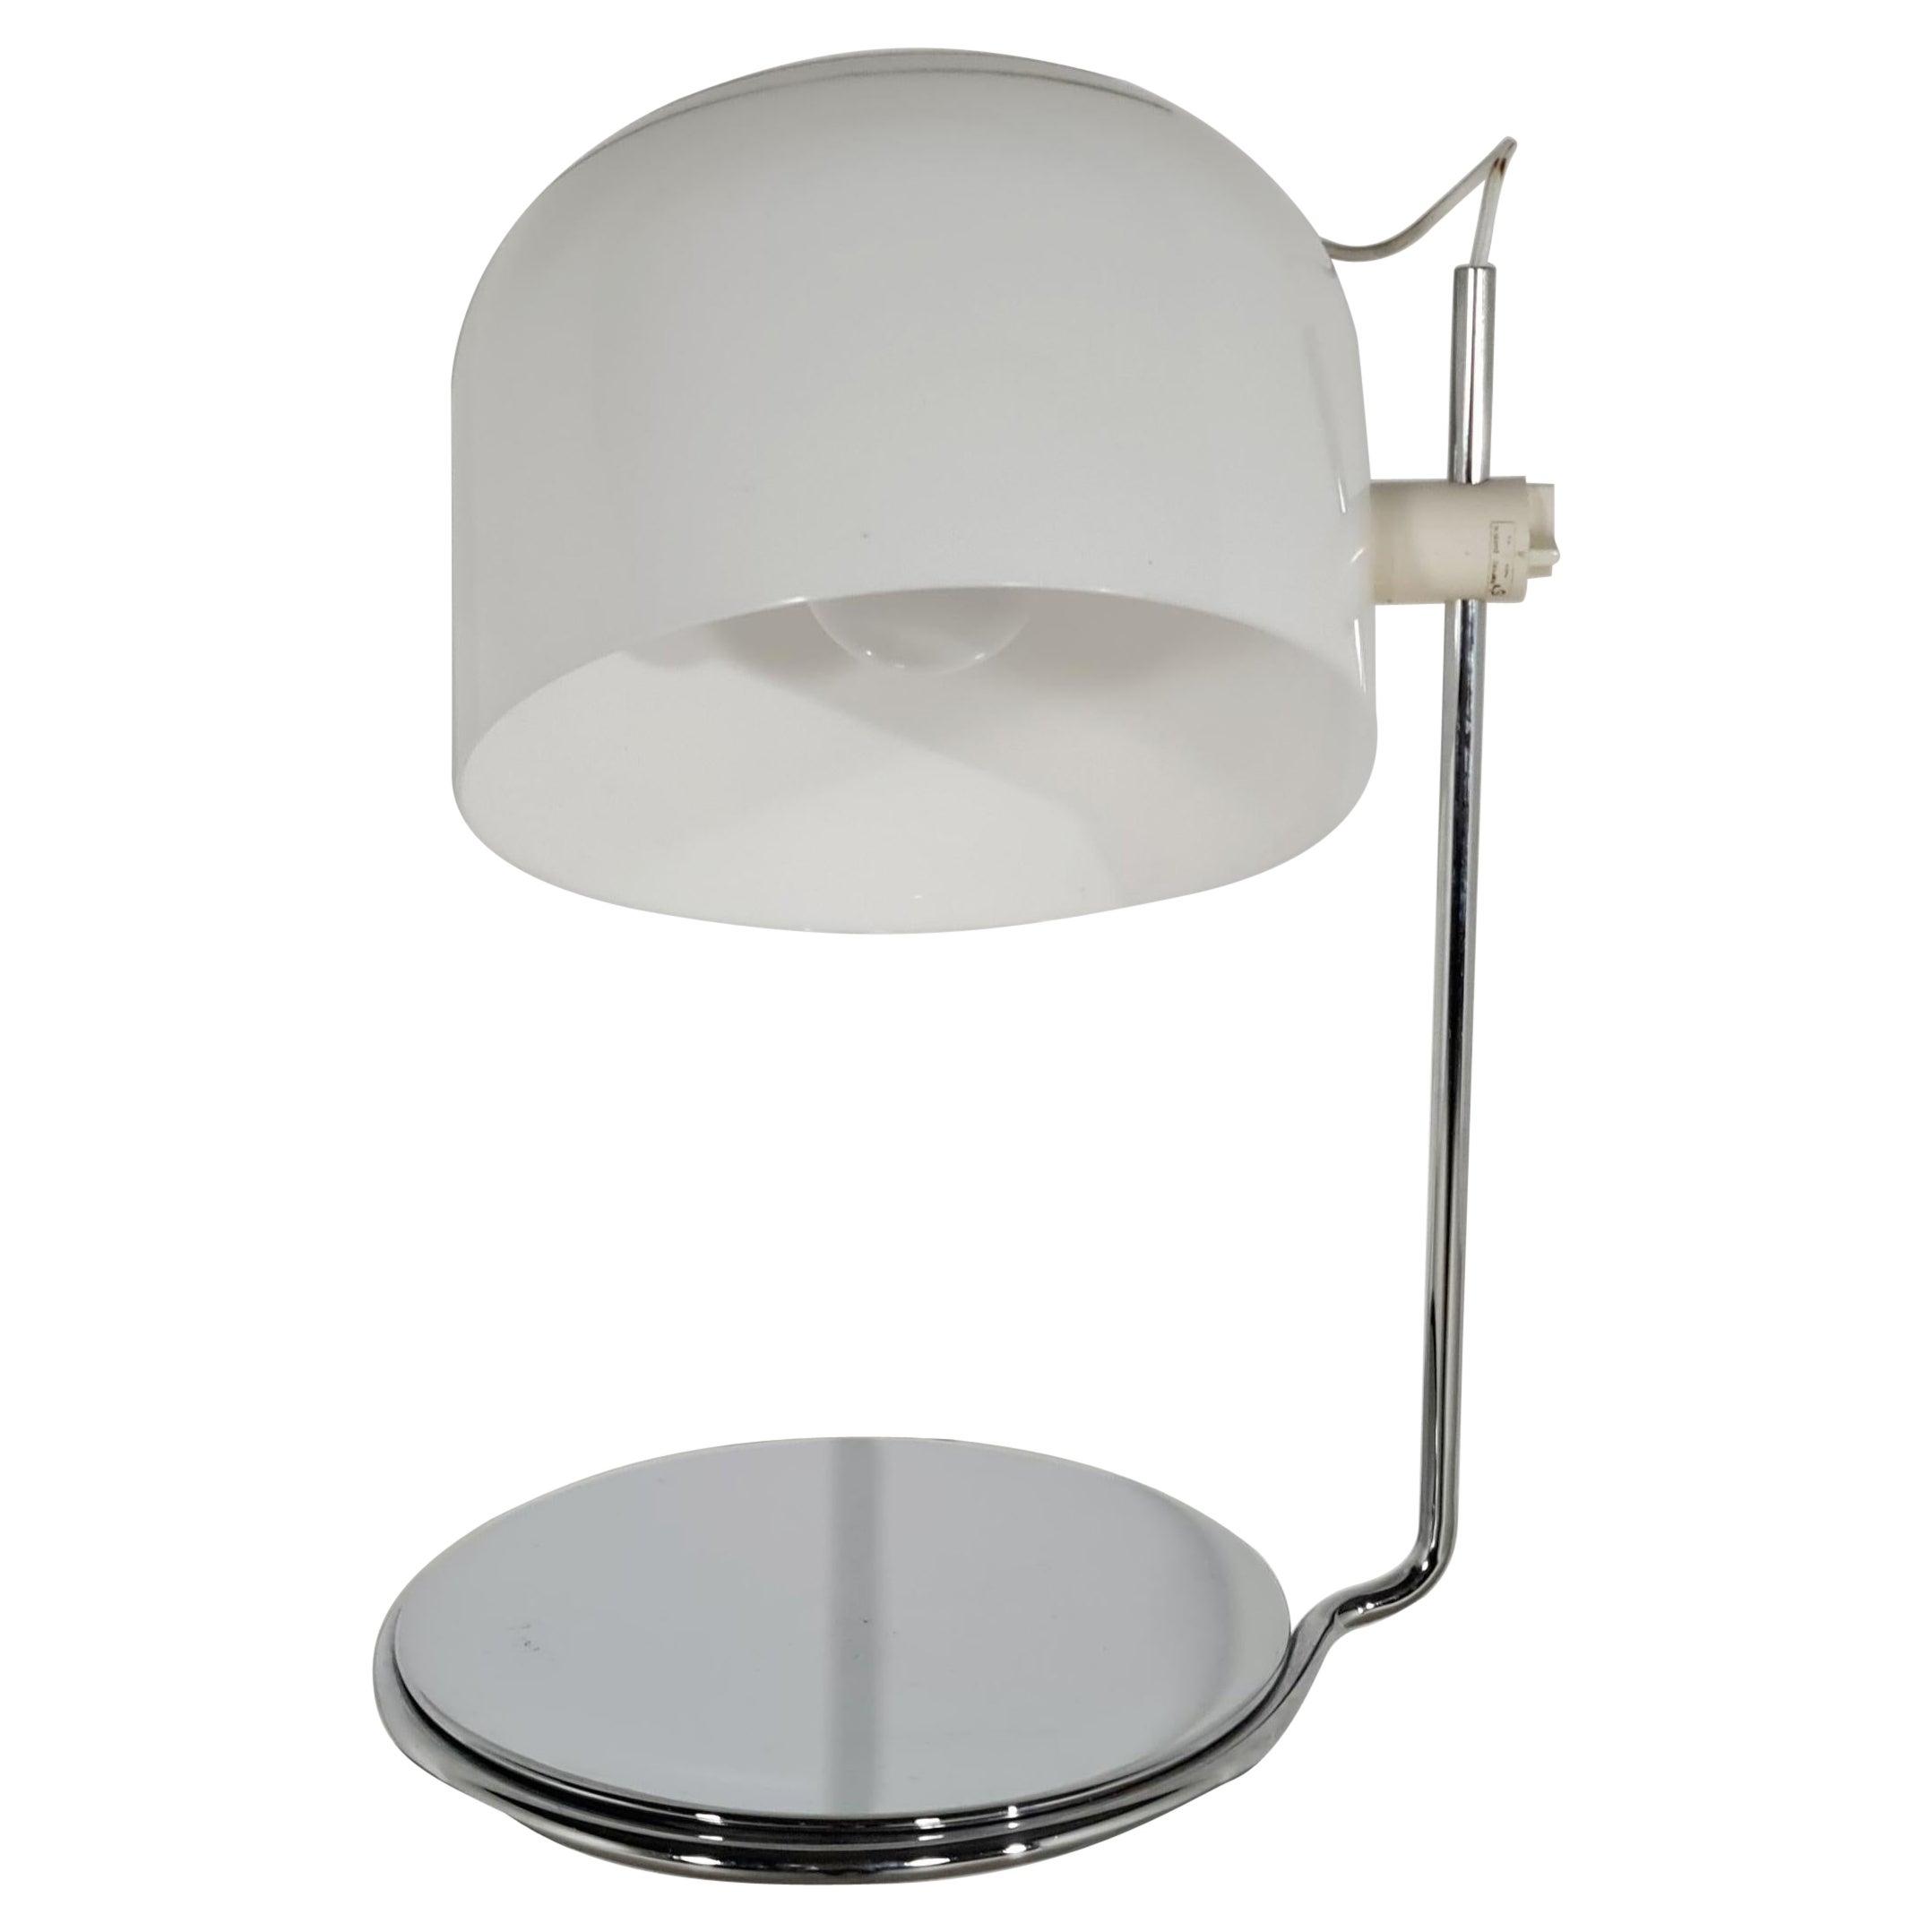 Harvey Guzzini Adjustable Table Lamp, 1960s